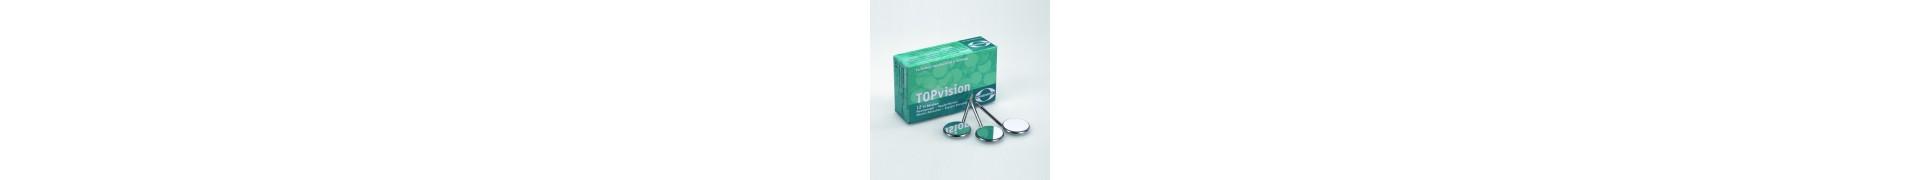 Zrcátka TOPvision